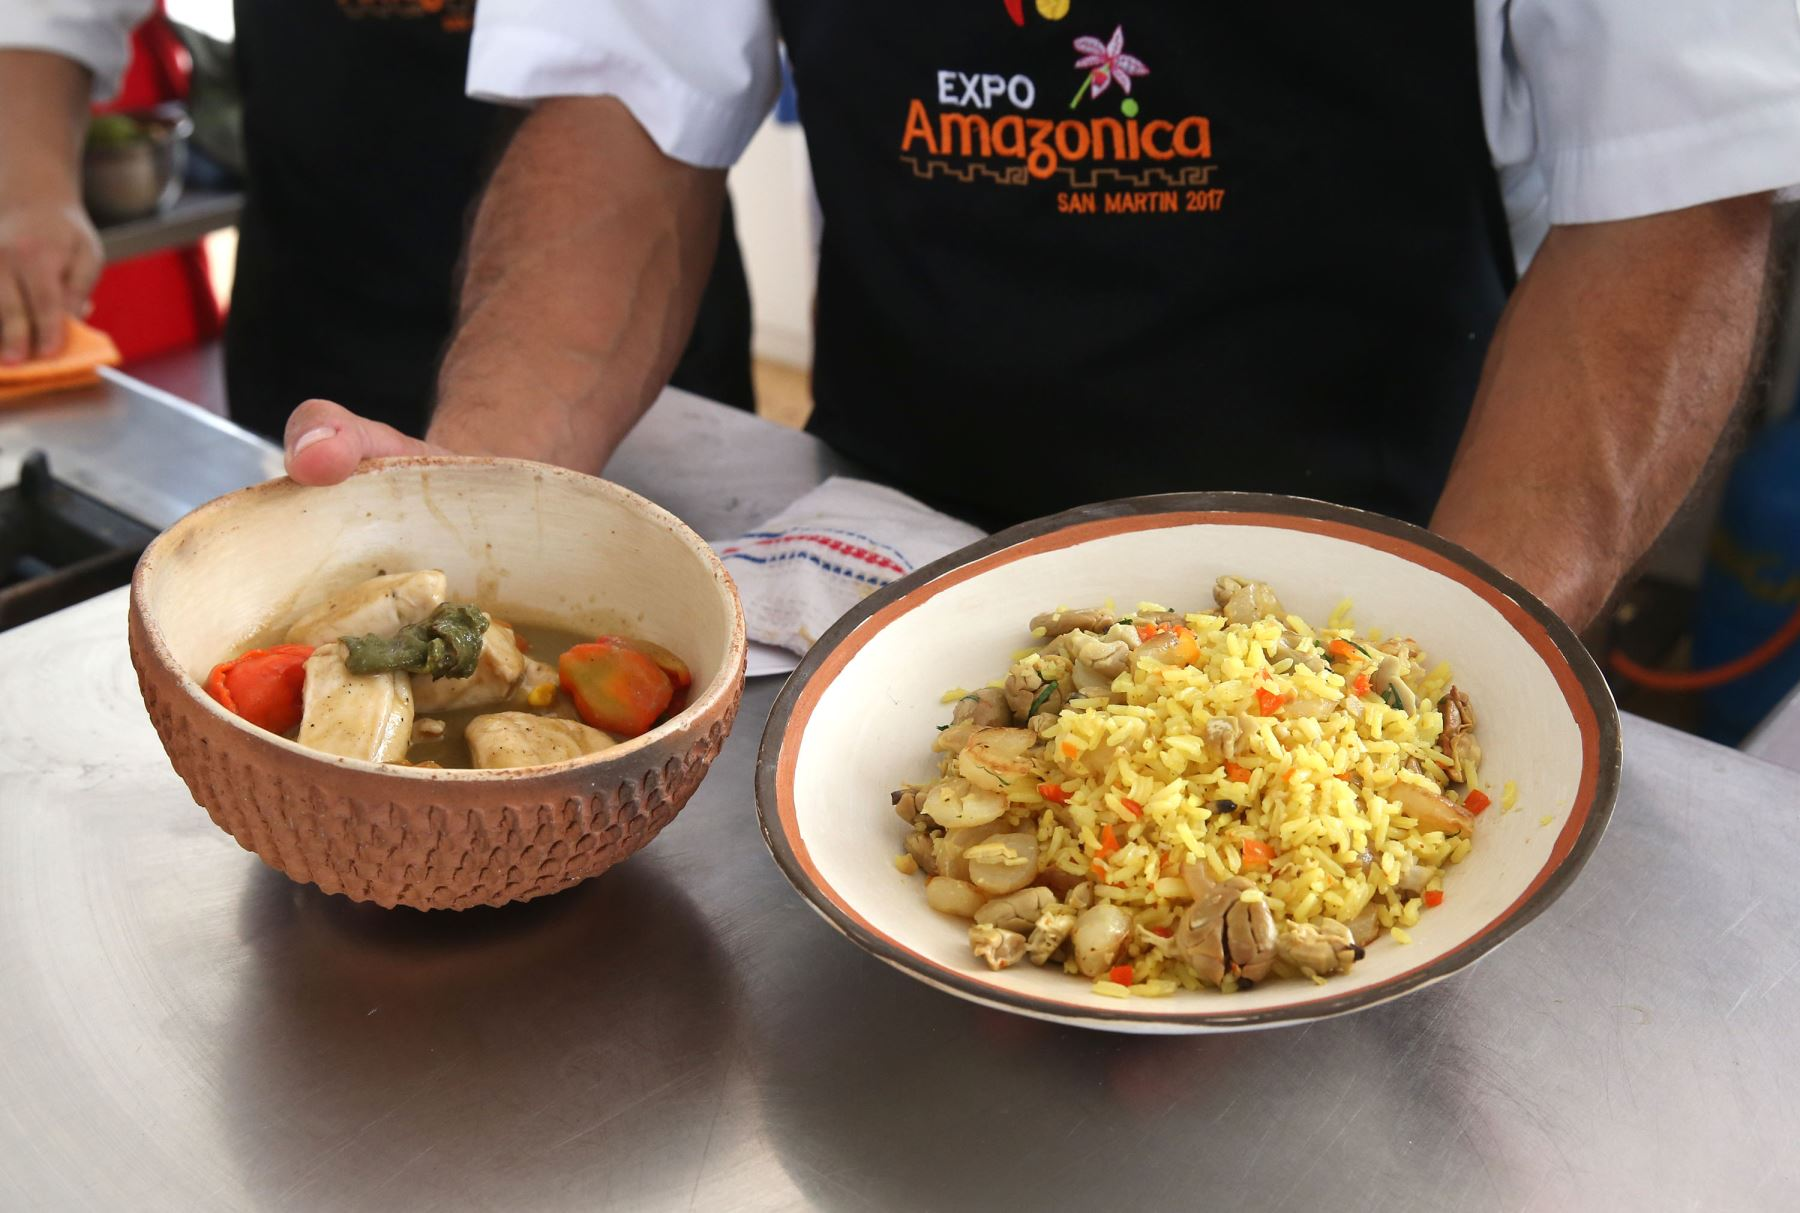 En Expo Amazónica se promueve el consumo de paiche a través de degustaciones gratuitas. ANDINA/Vidal Tarqui